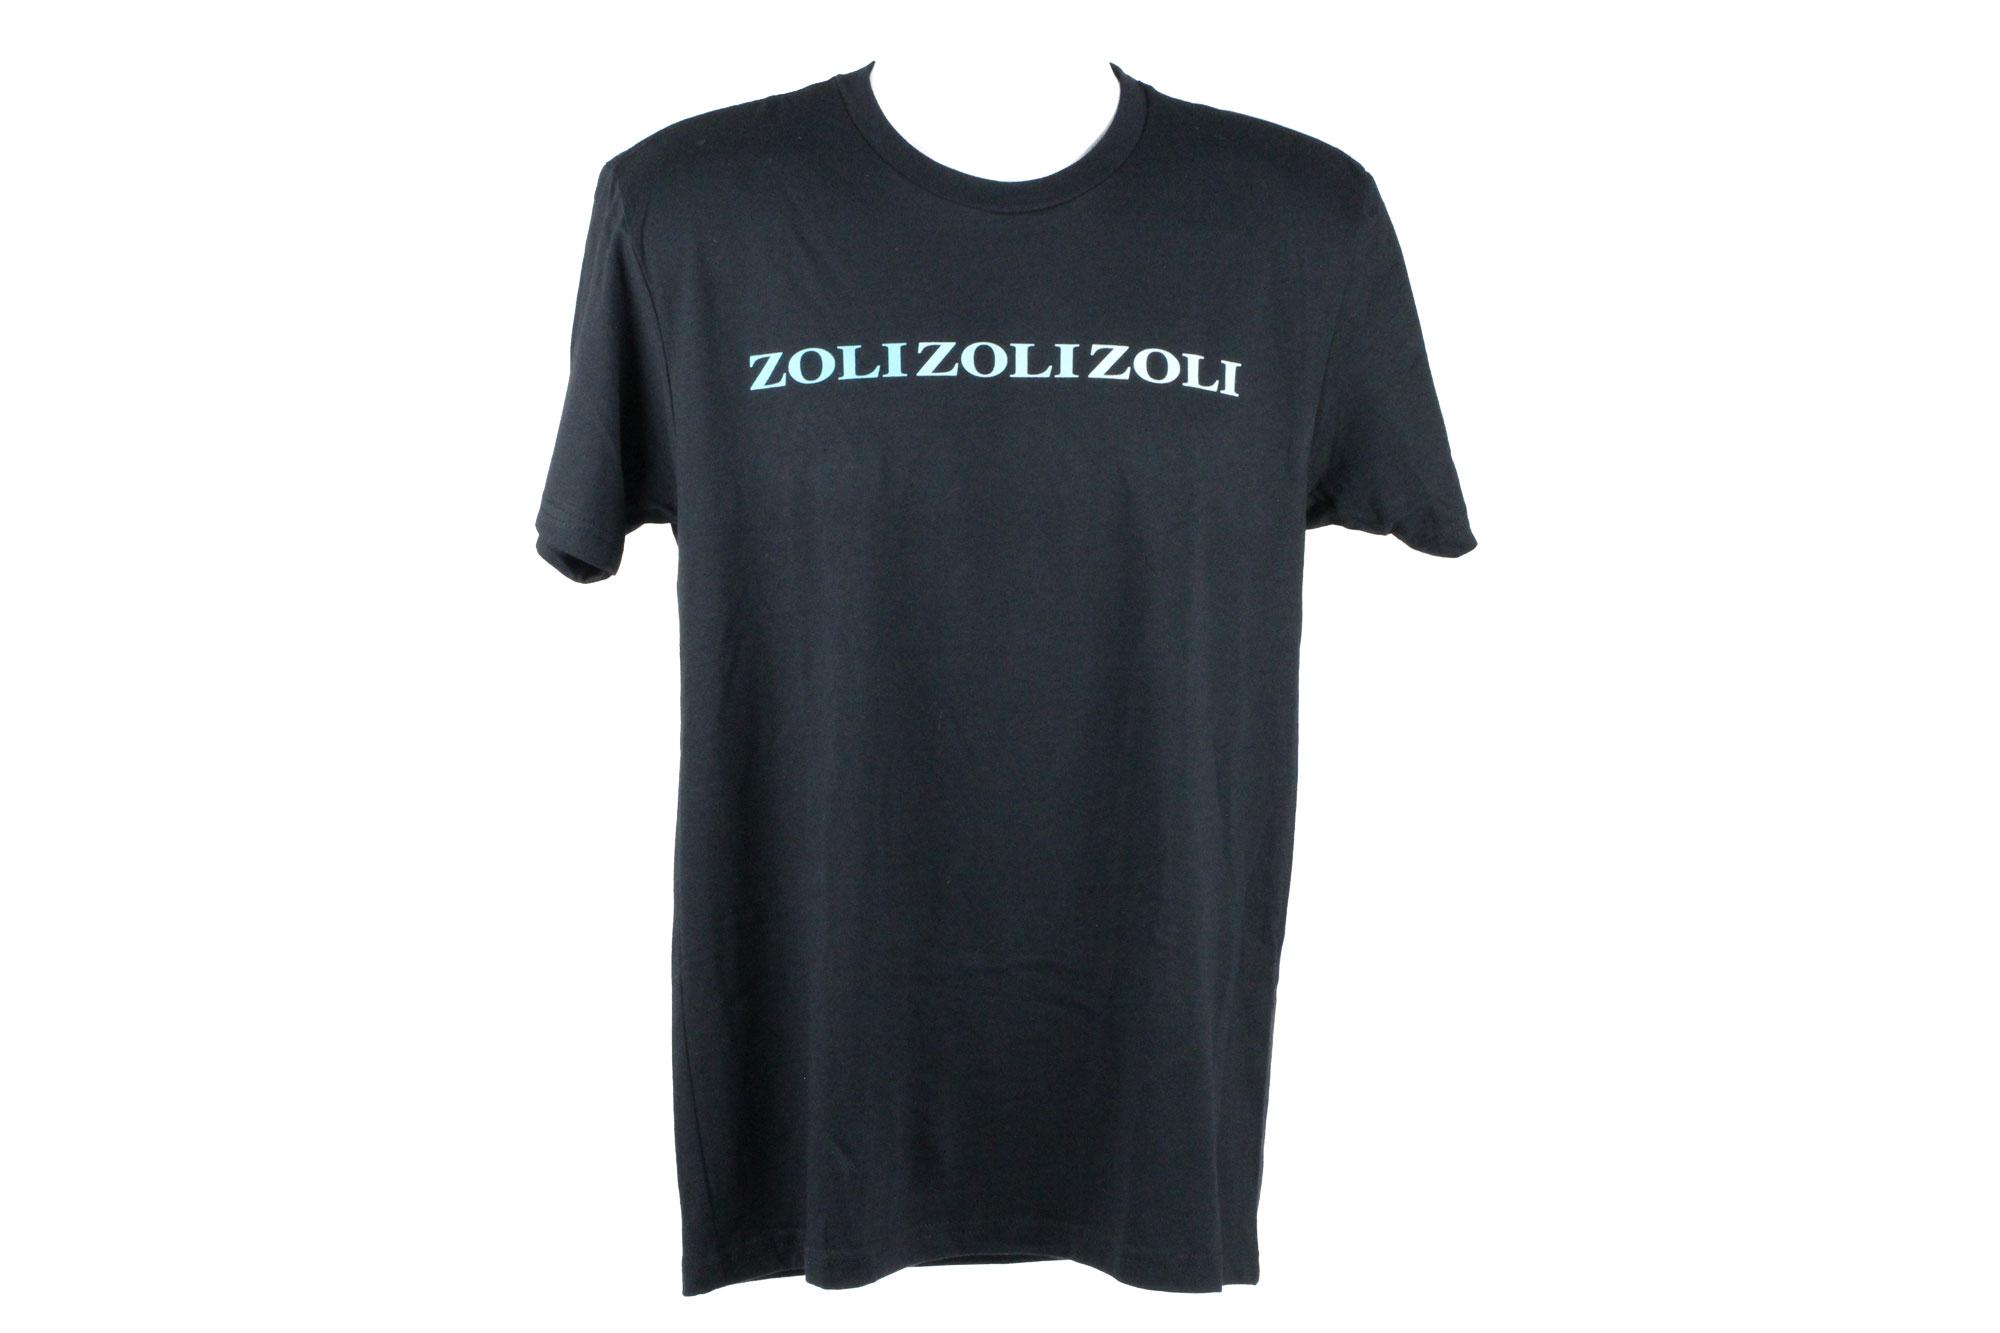 Zoli Zoli Zoli Black Cotton Shirt